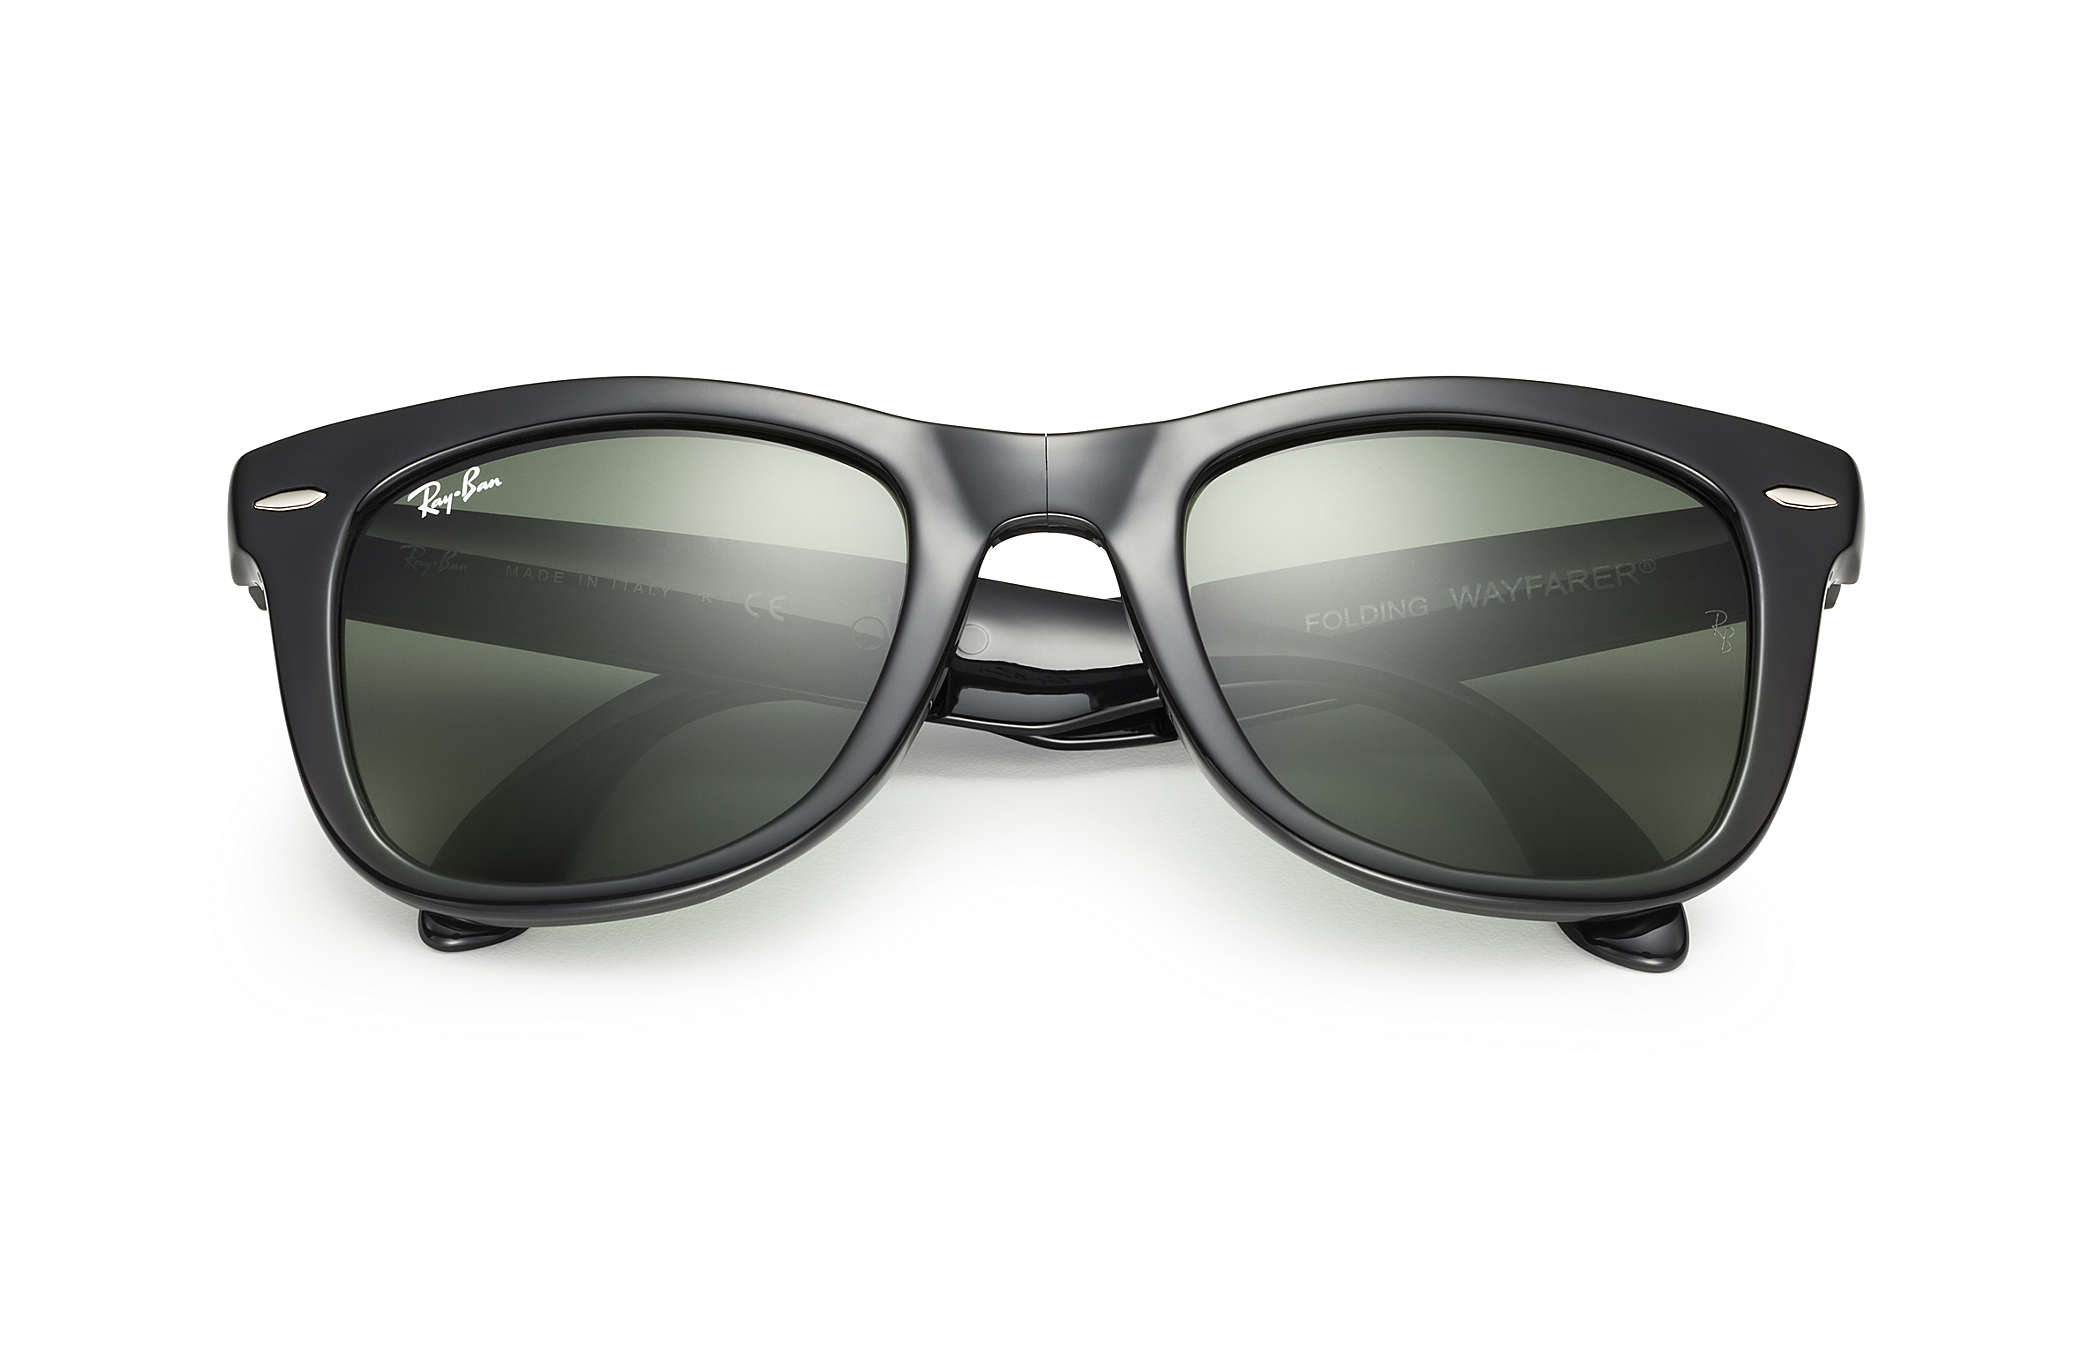 Ray-Ban Wayfarer Folding Classic Black , RB4105 | Ray-Ban® USA